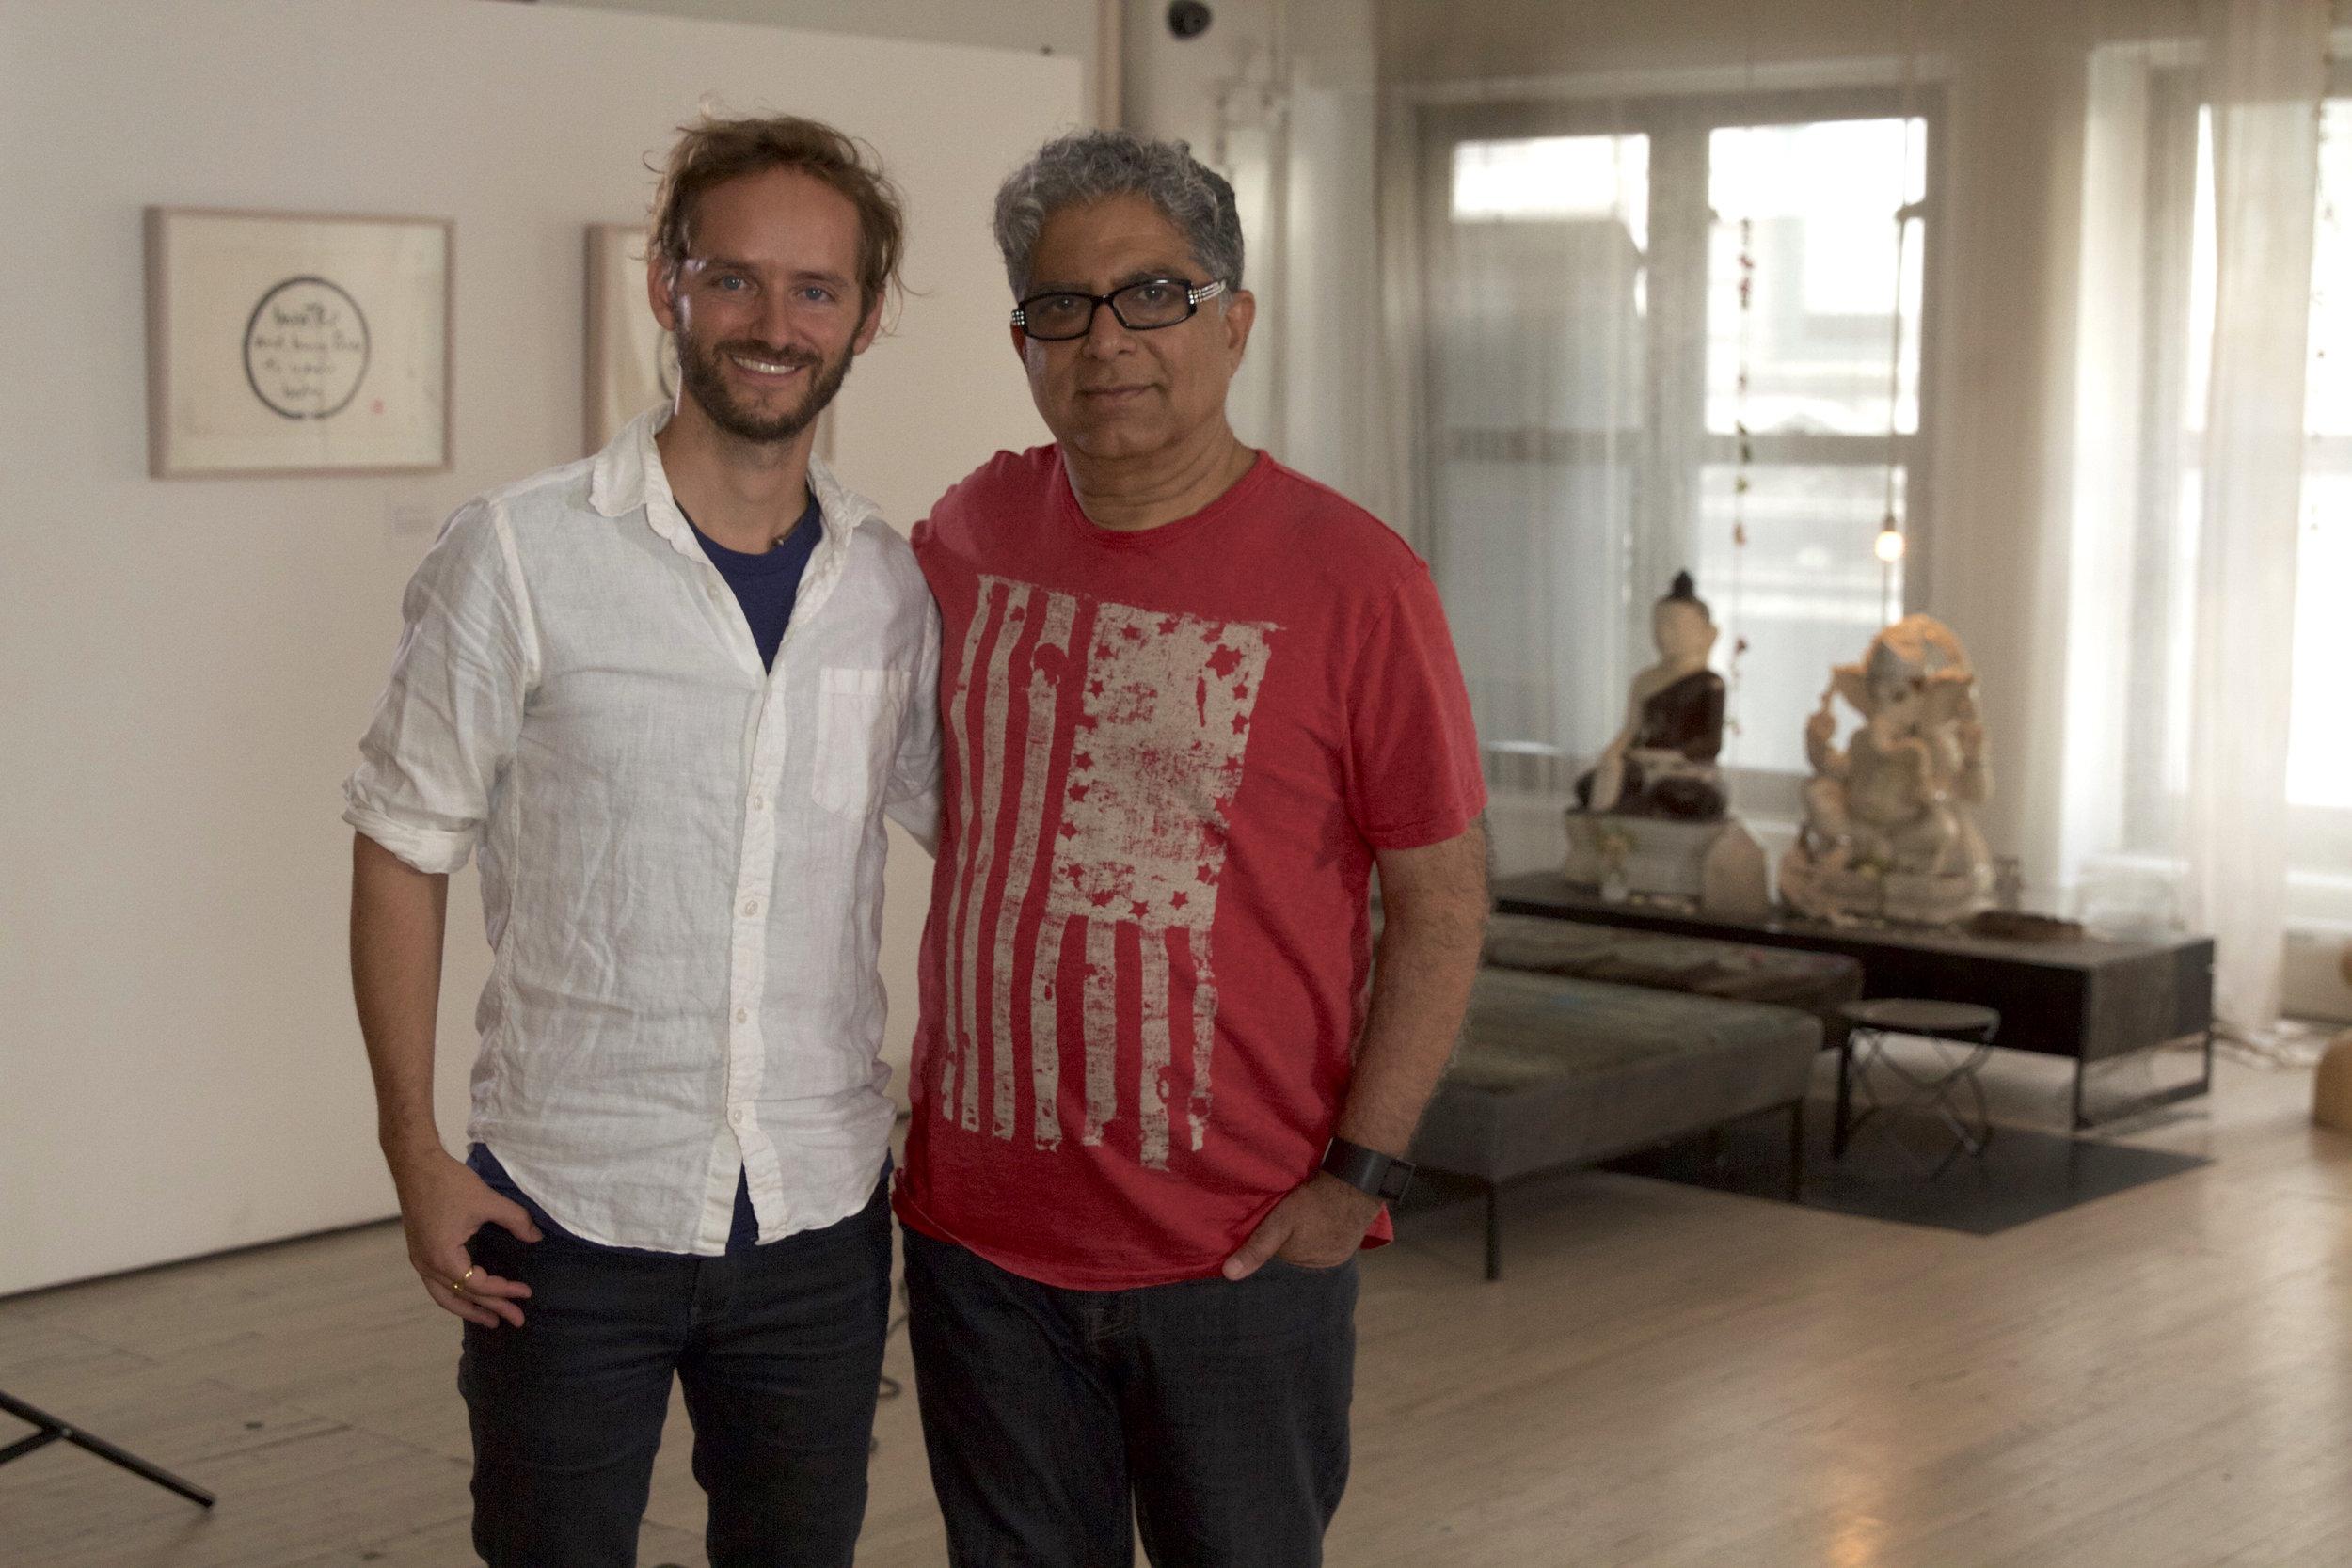 Deepak Chopra and Jeremy Frindel after interviewing Deepak for the film.